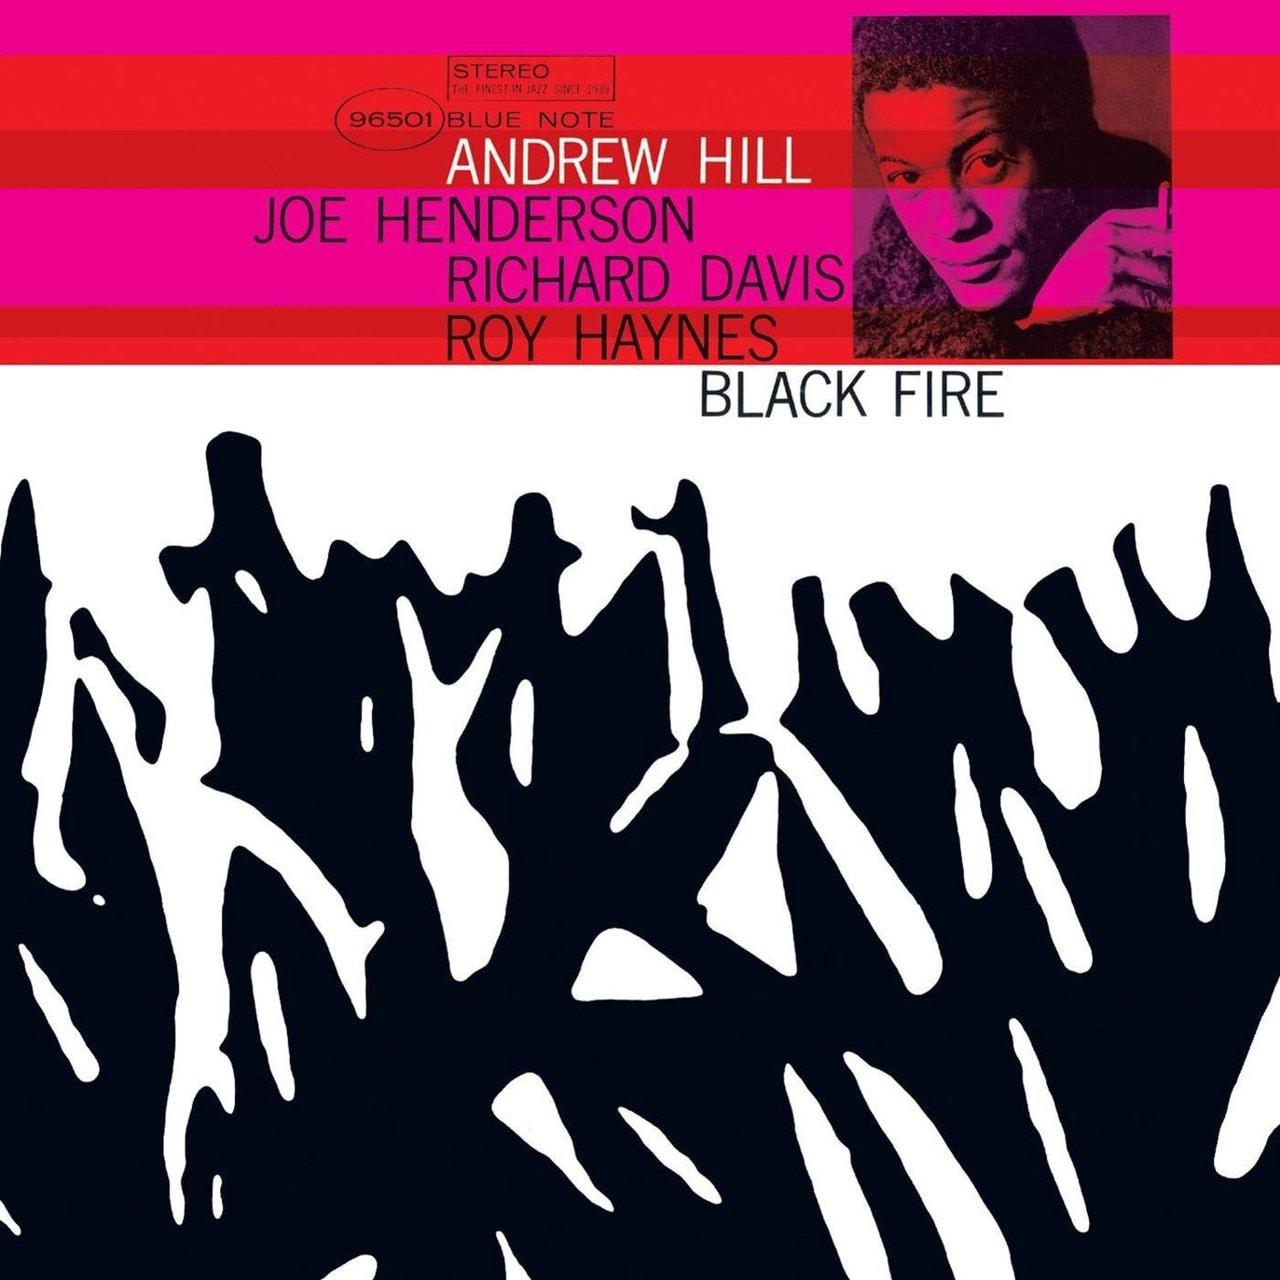 Black Fire - 1